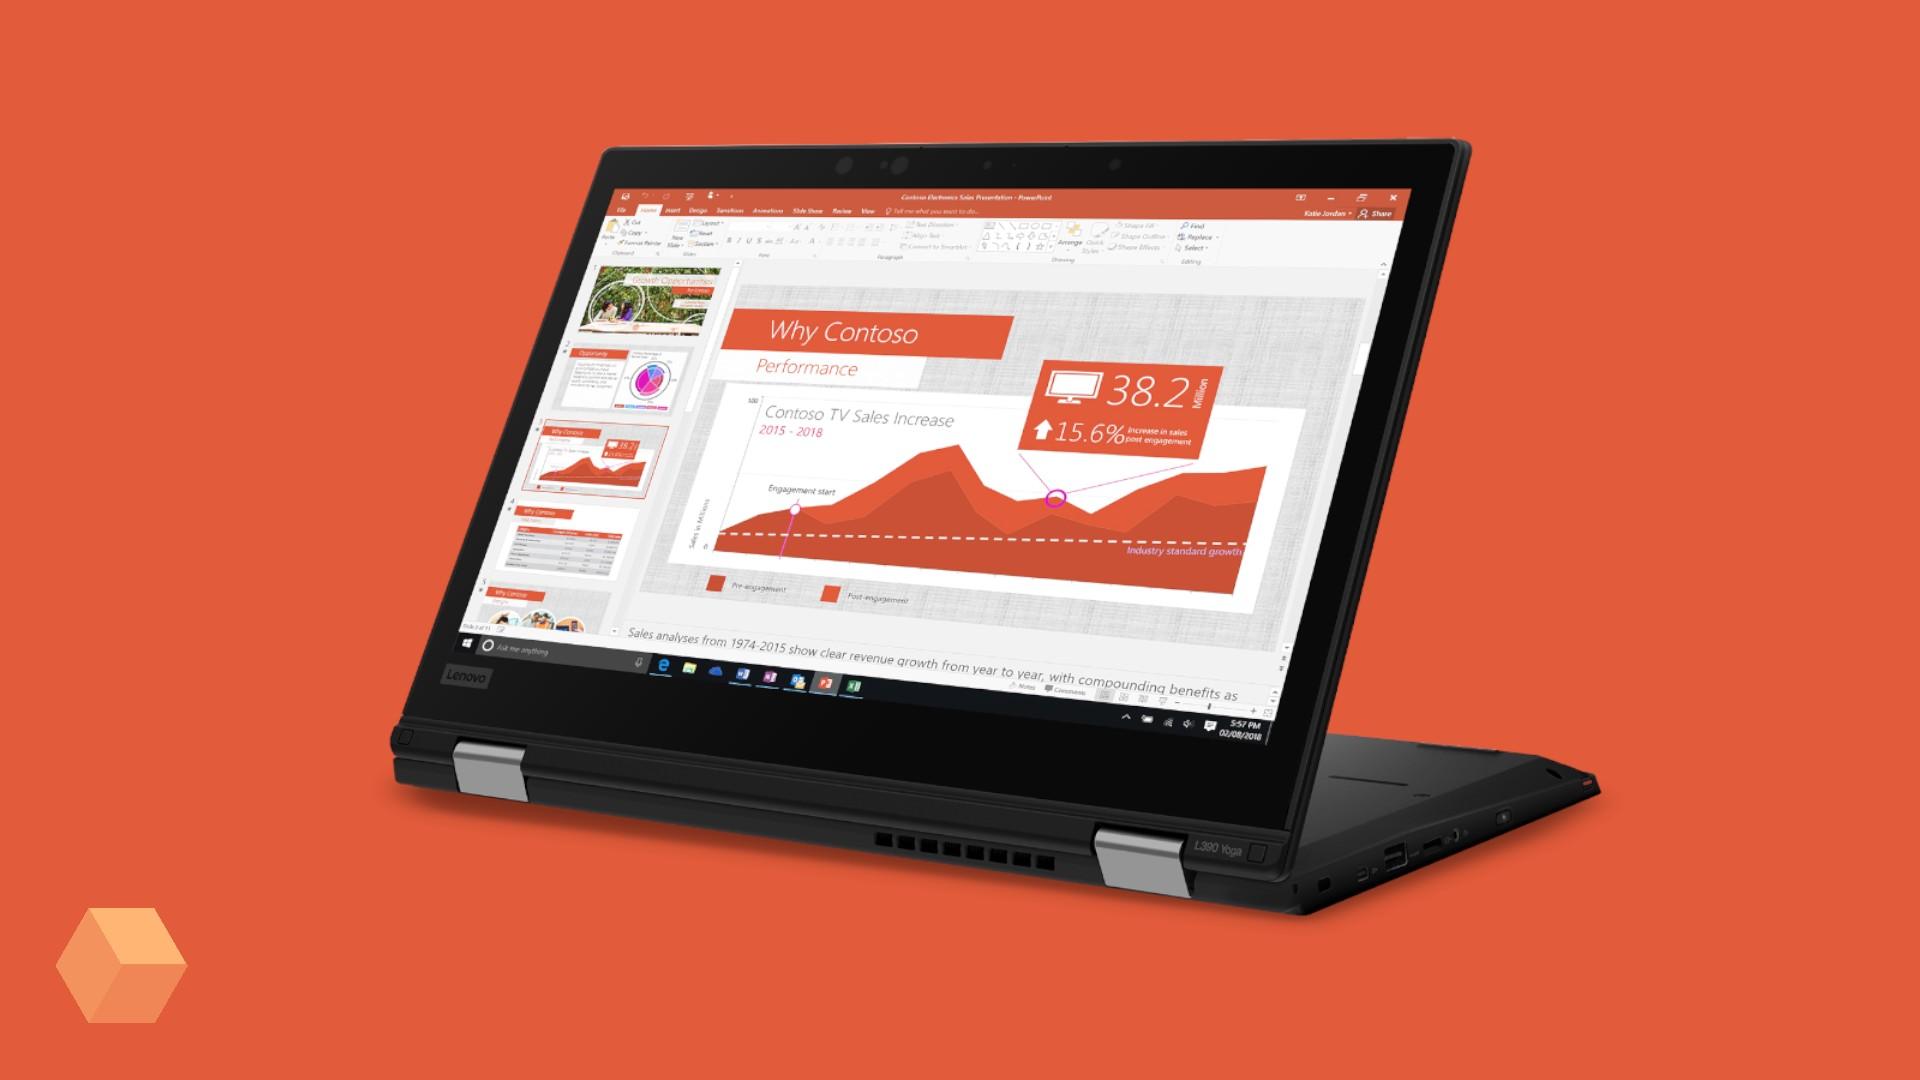 Lenovo представила бизнес-ноутбуки ThinkPad L390 и L390 Yoga